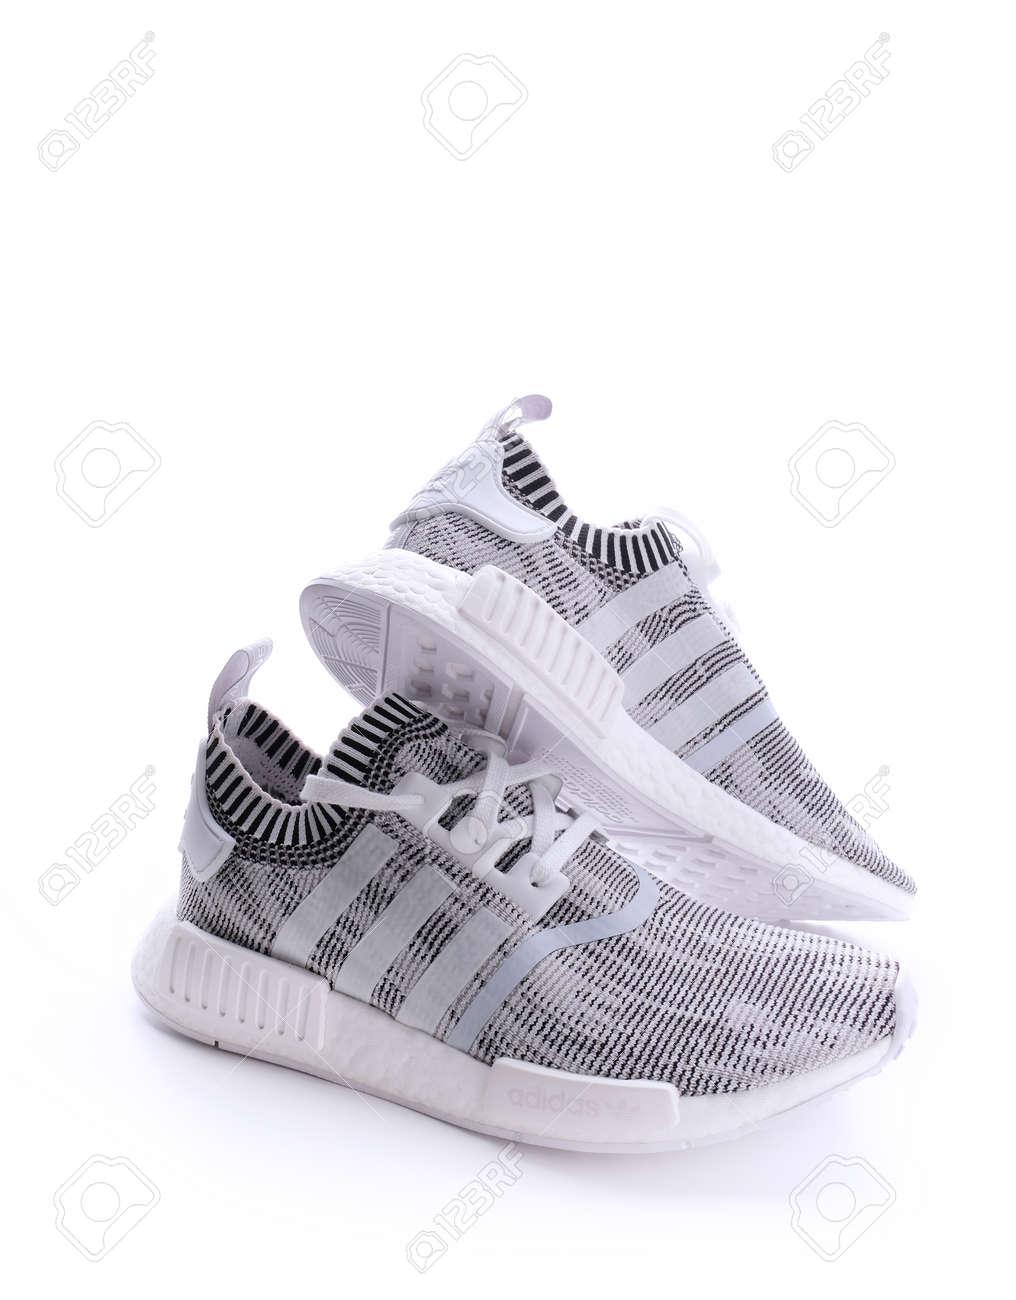 adidas nmd runner primeknit malaysia